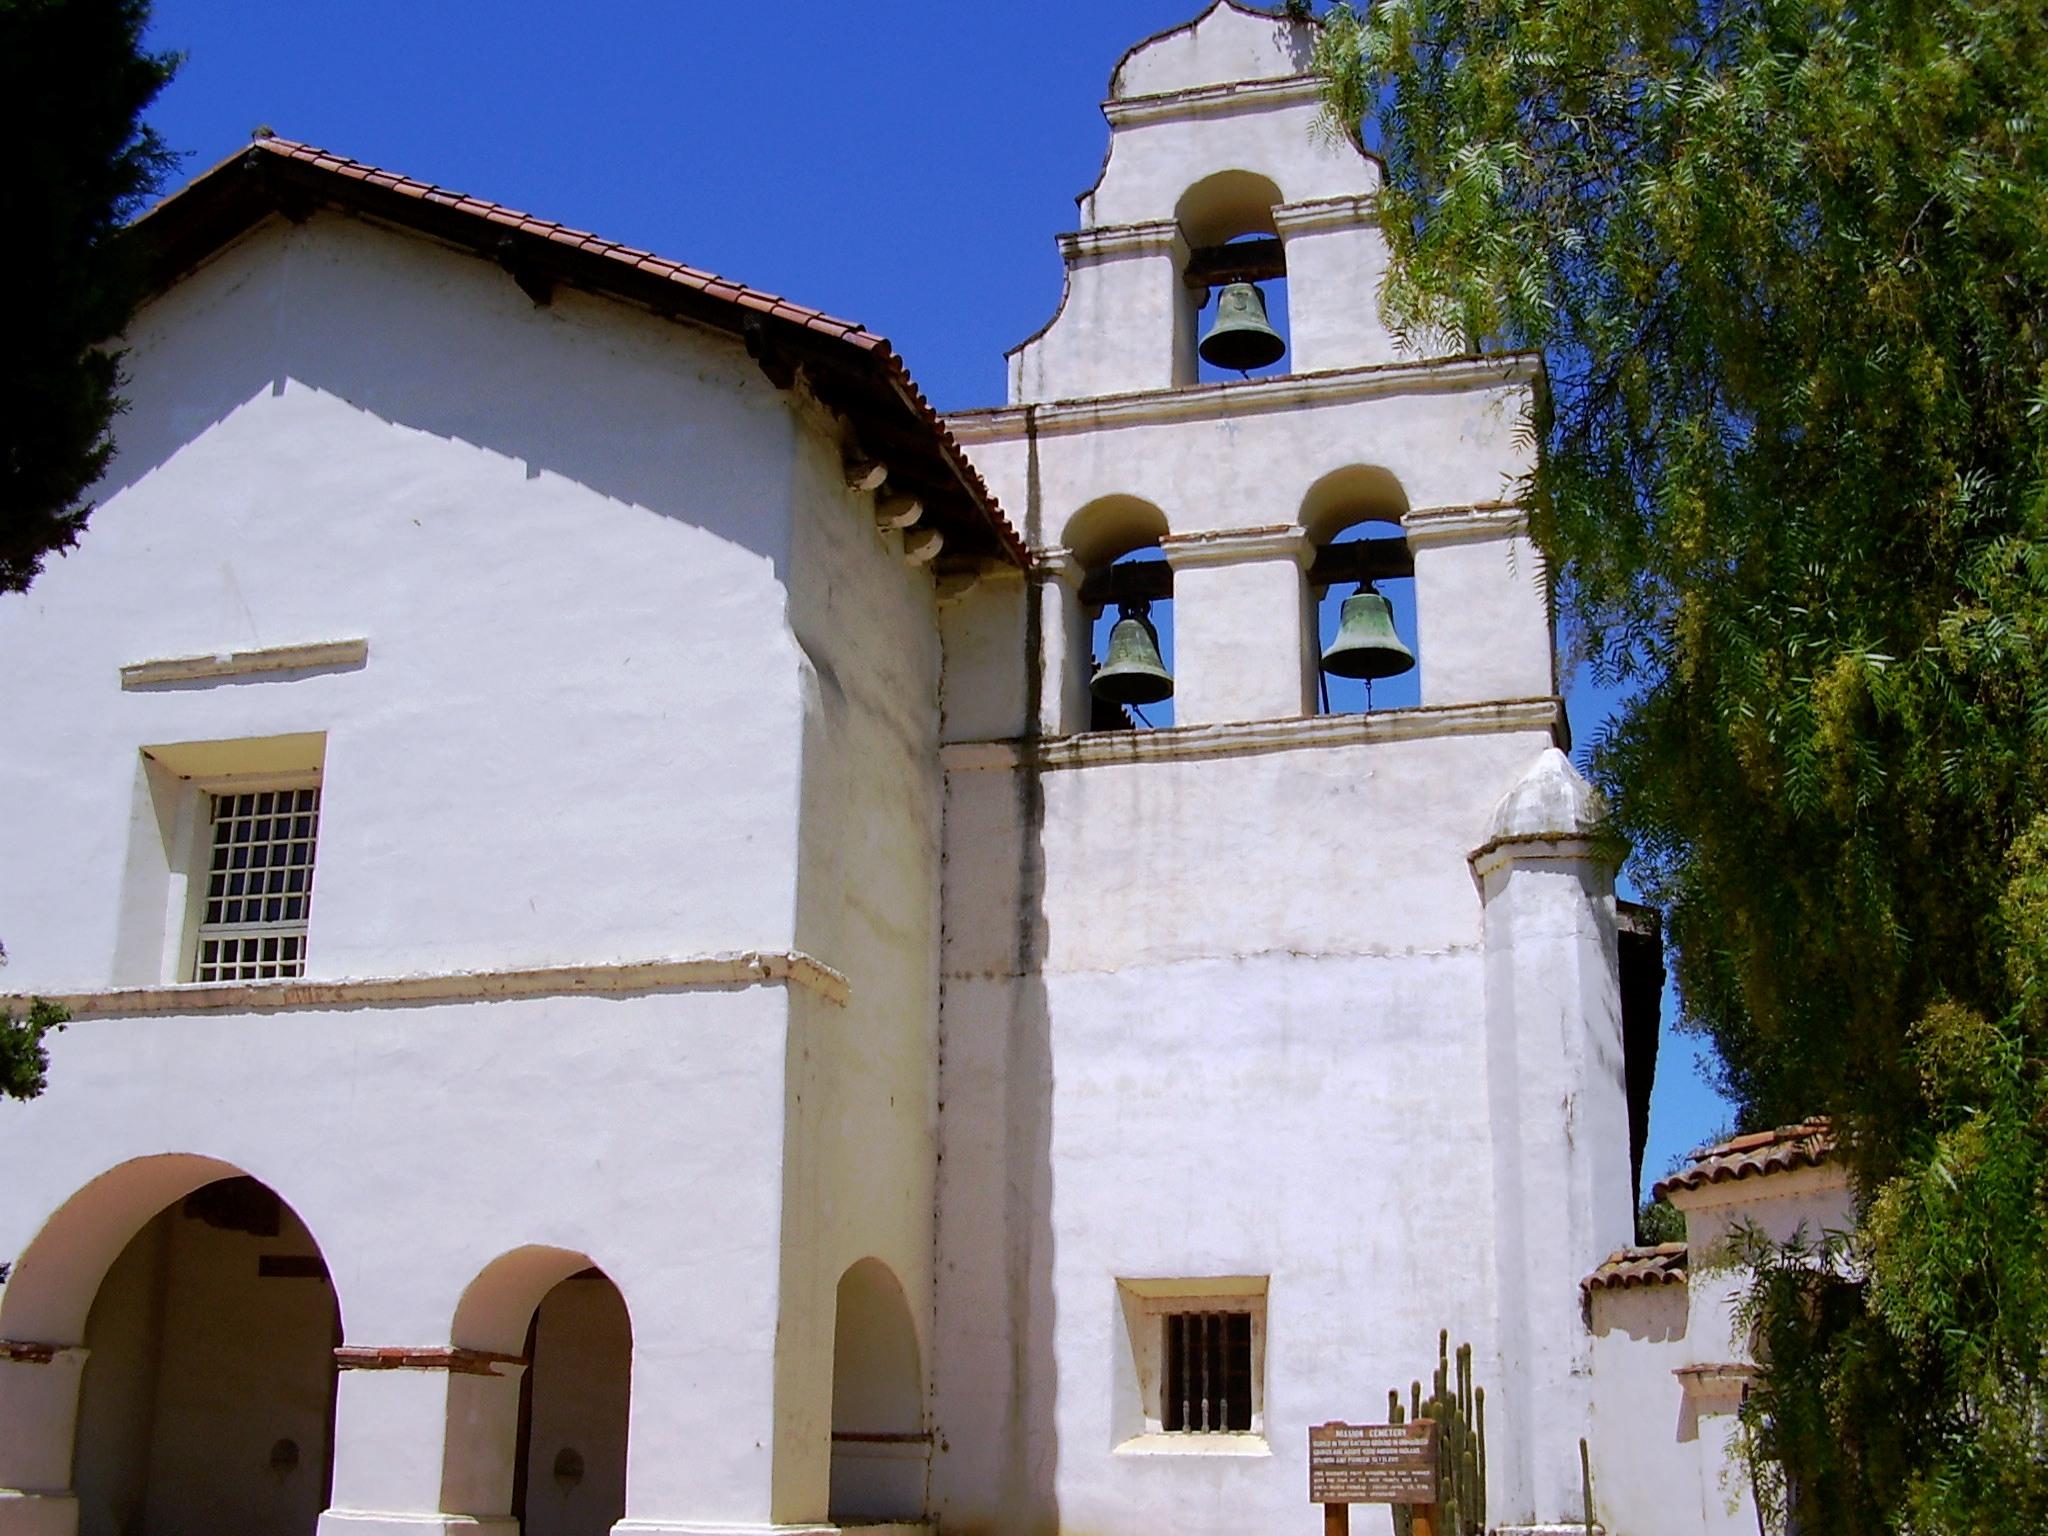 San Juan Bautista (California)